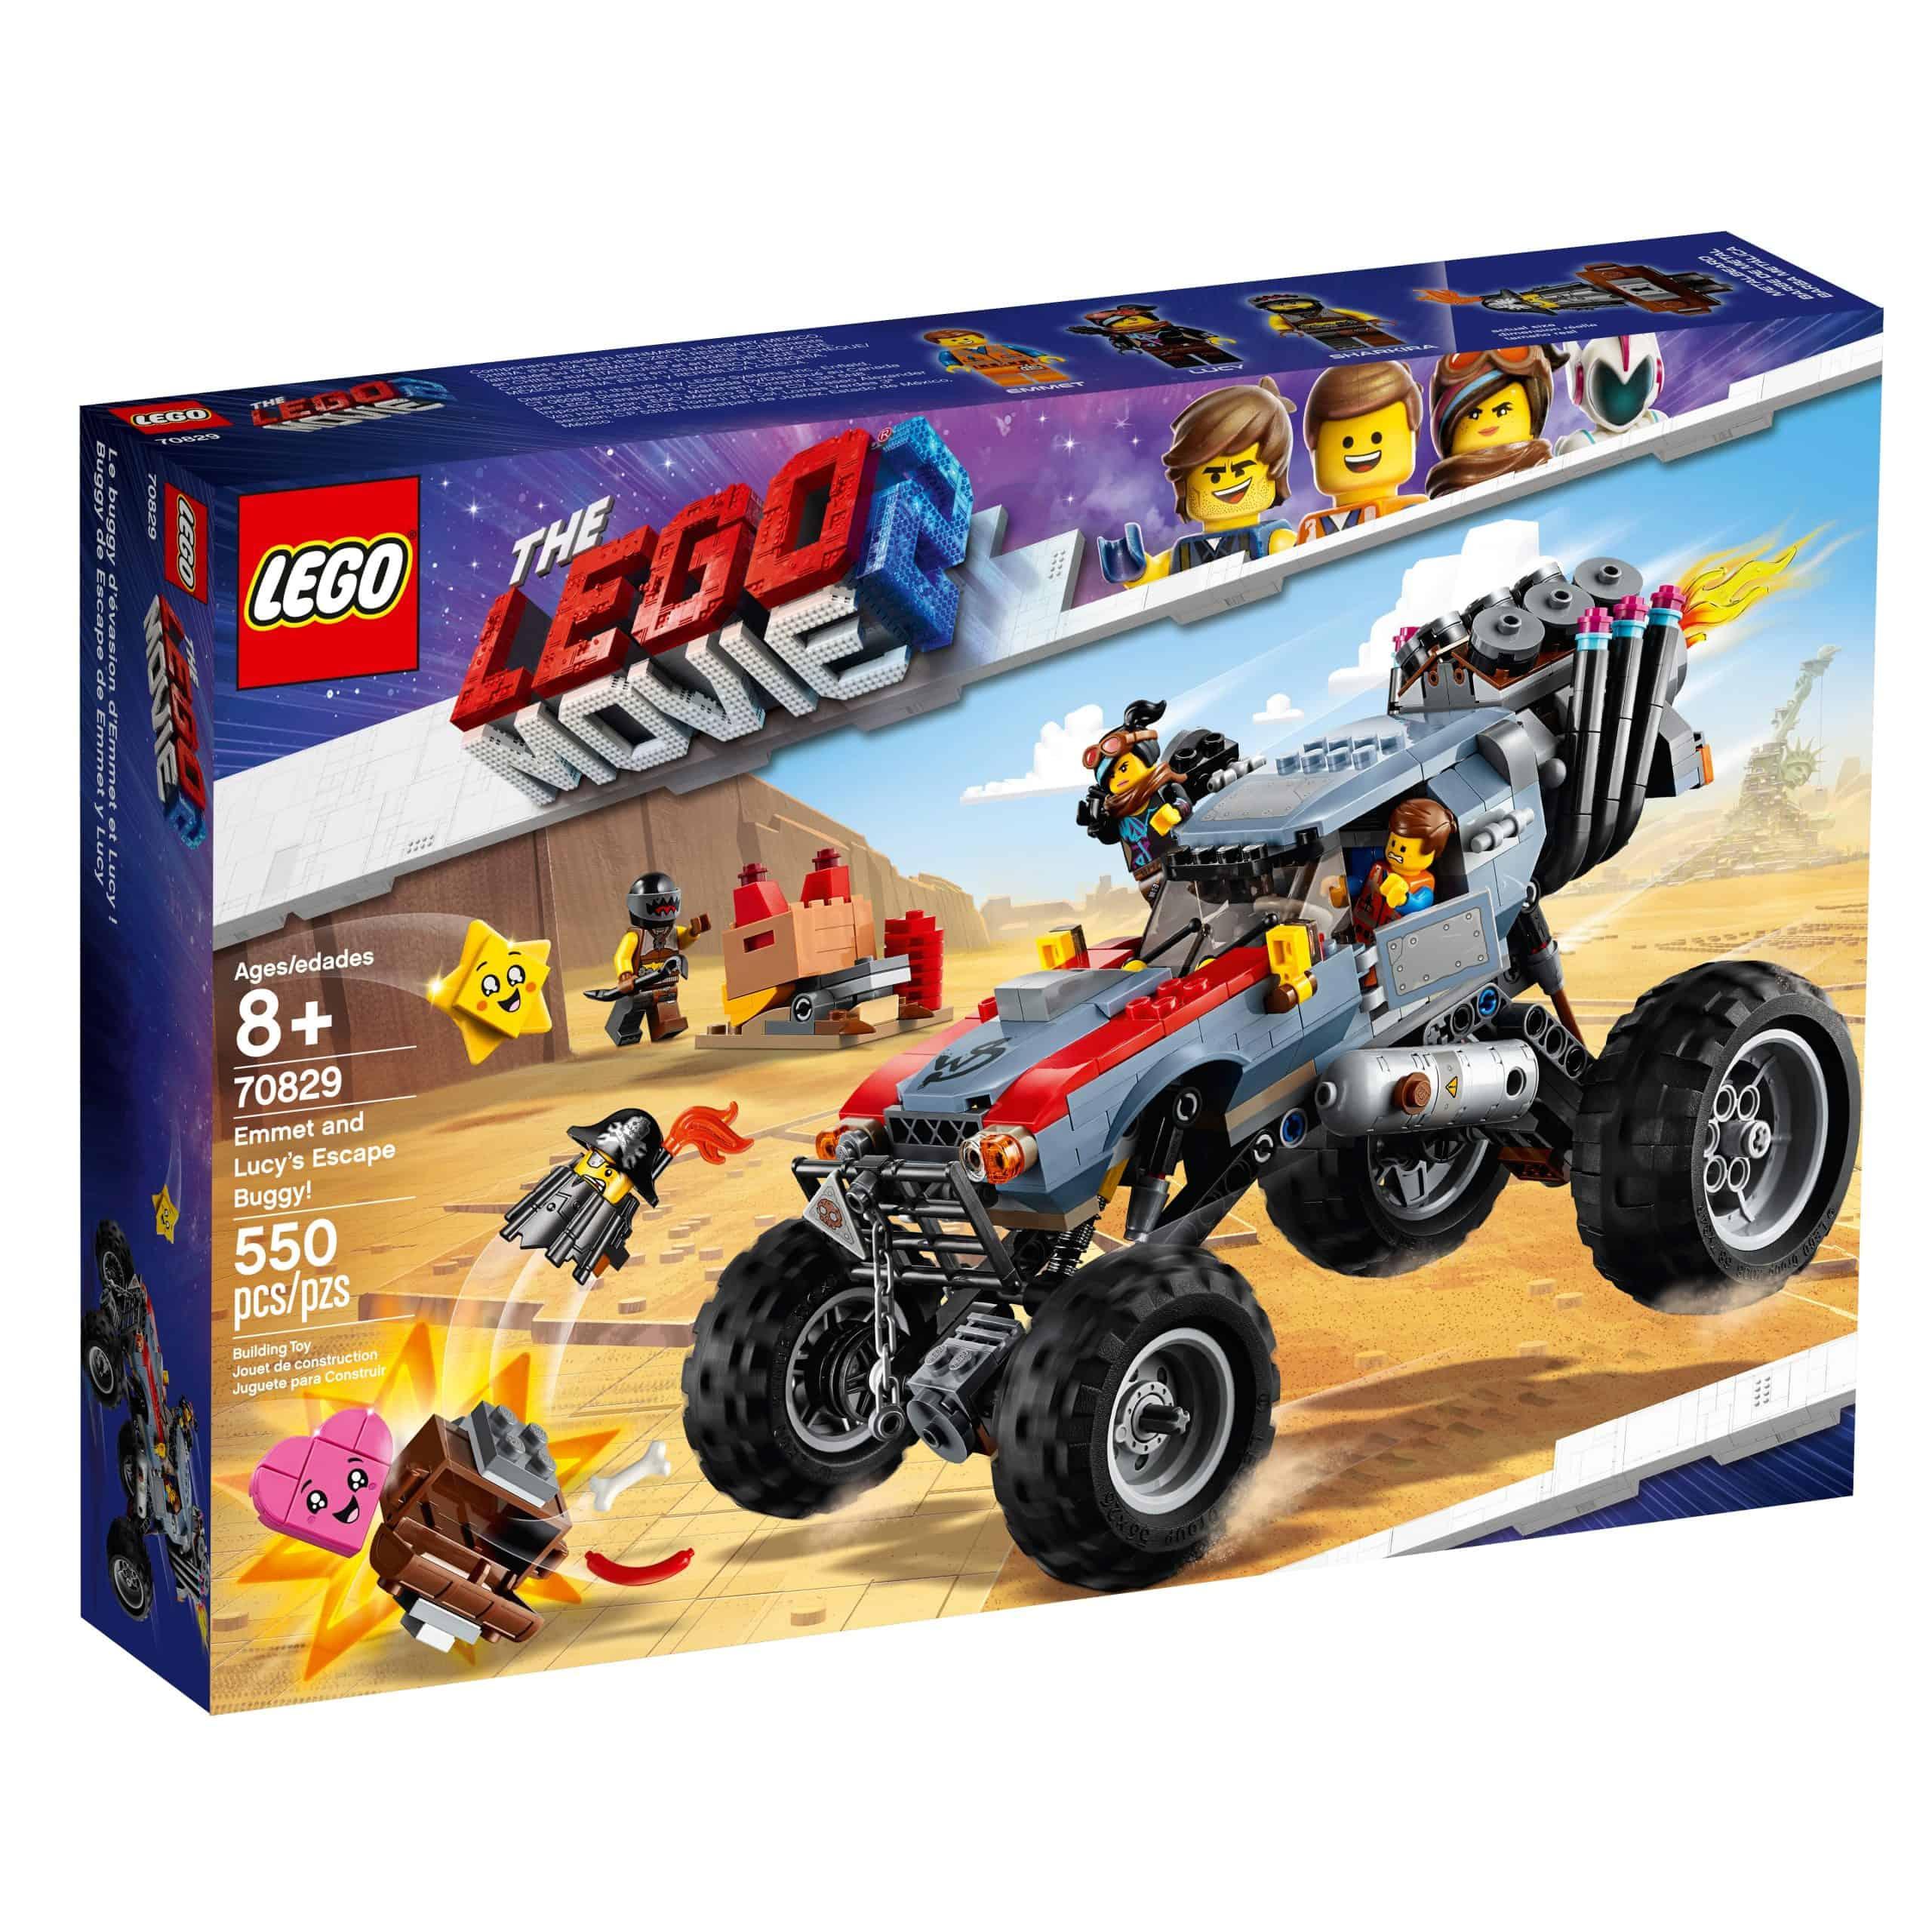 lego 70829 le buggy devasion demmet et lucy scaled